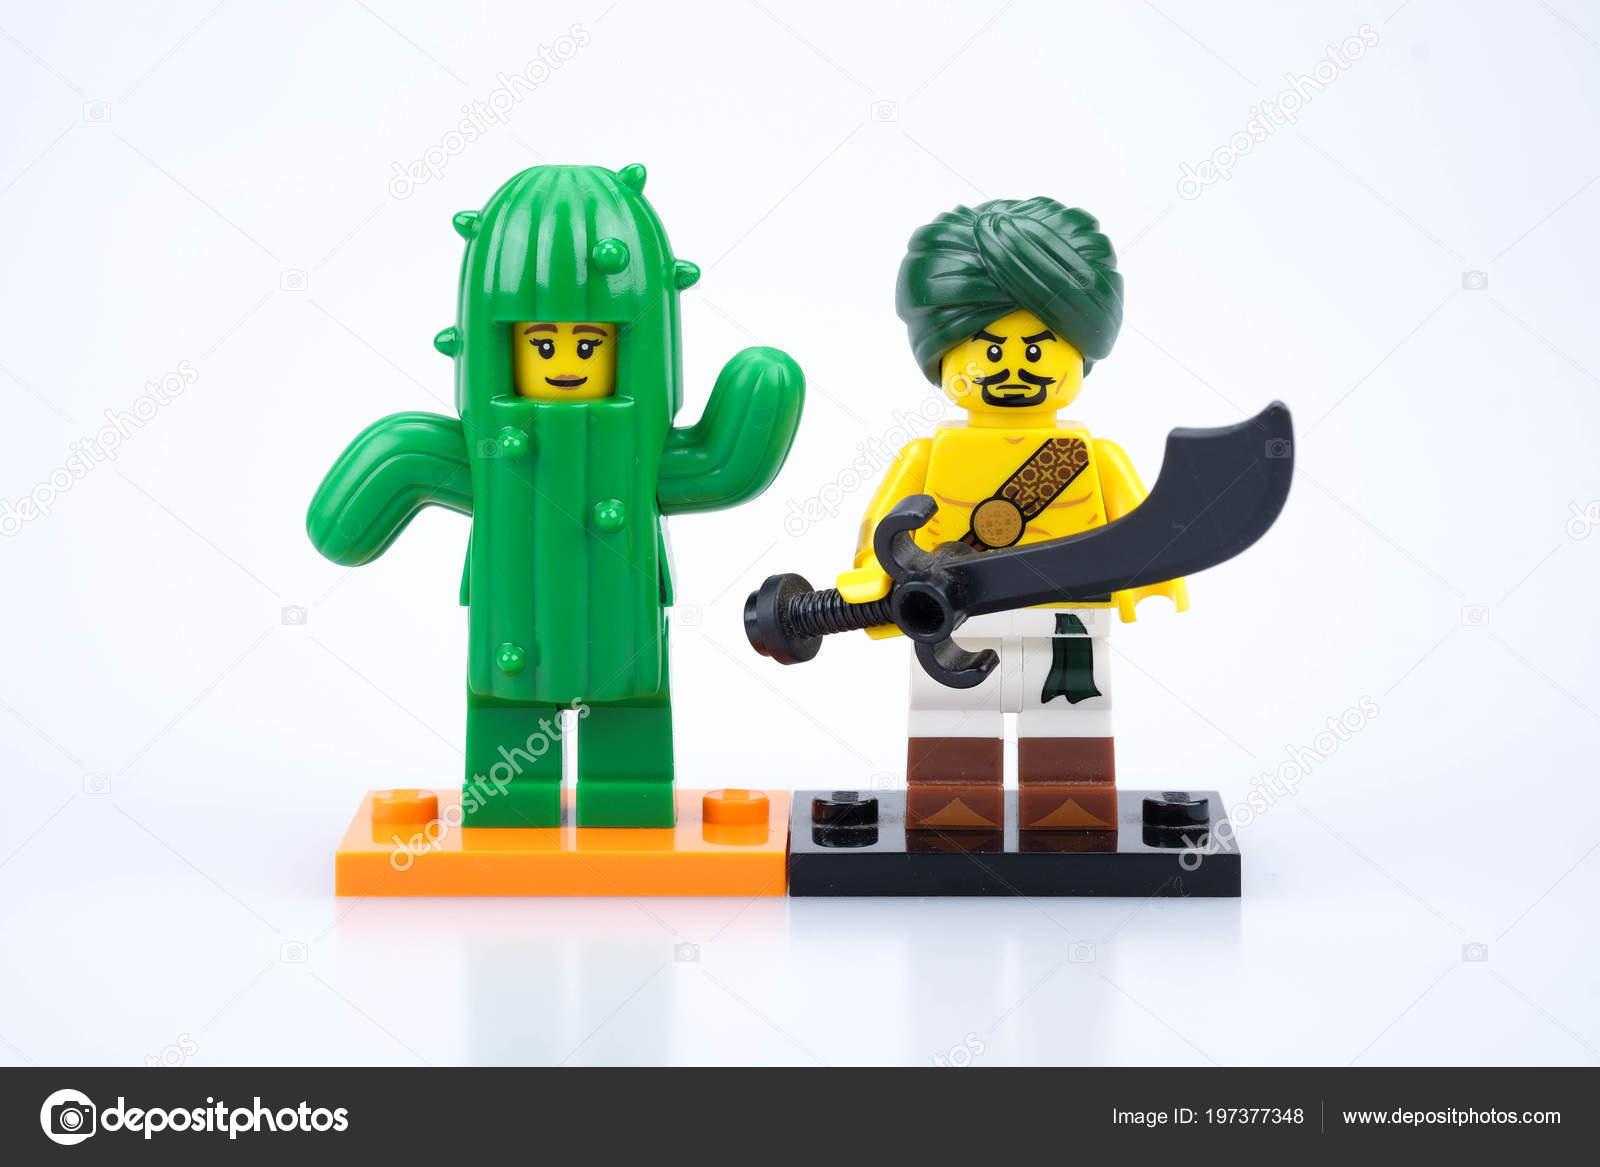 Mini Figure Chiang Jouet Une Mai Lego 2018 Thaïlande LqGSUpMVz